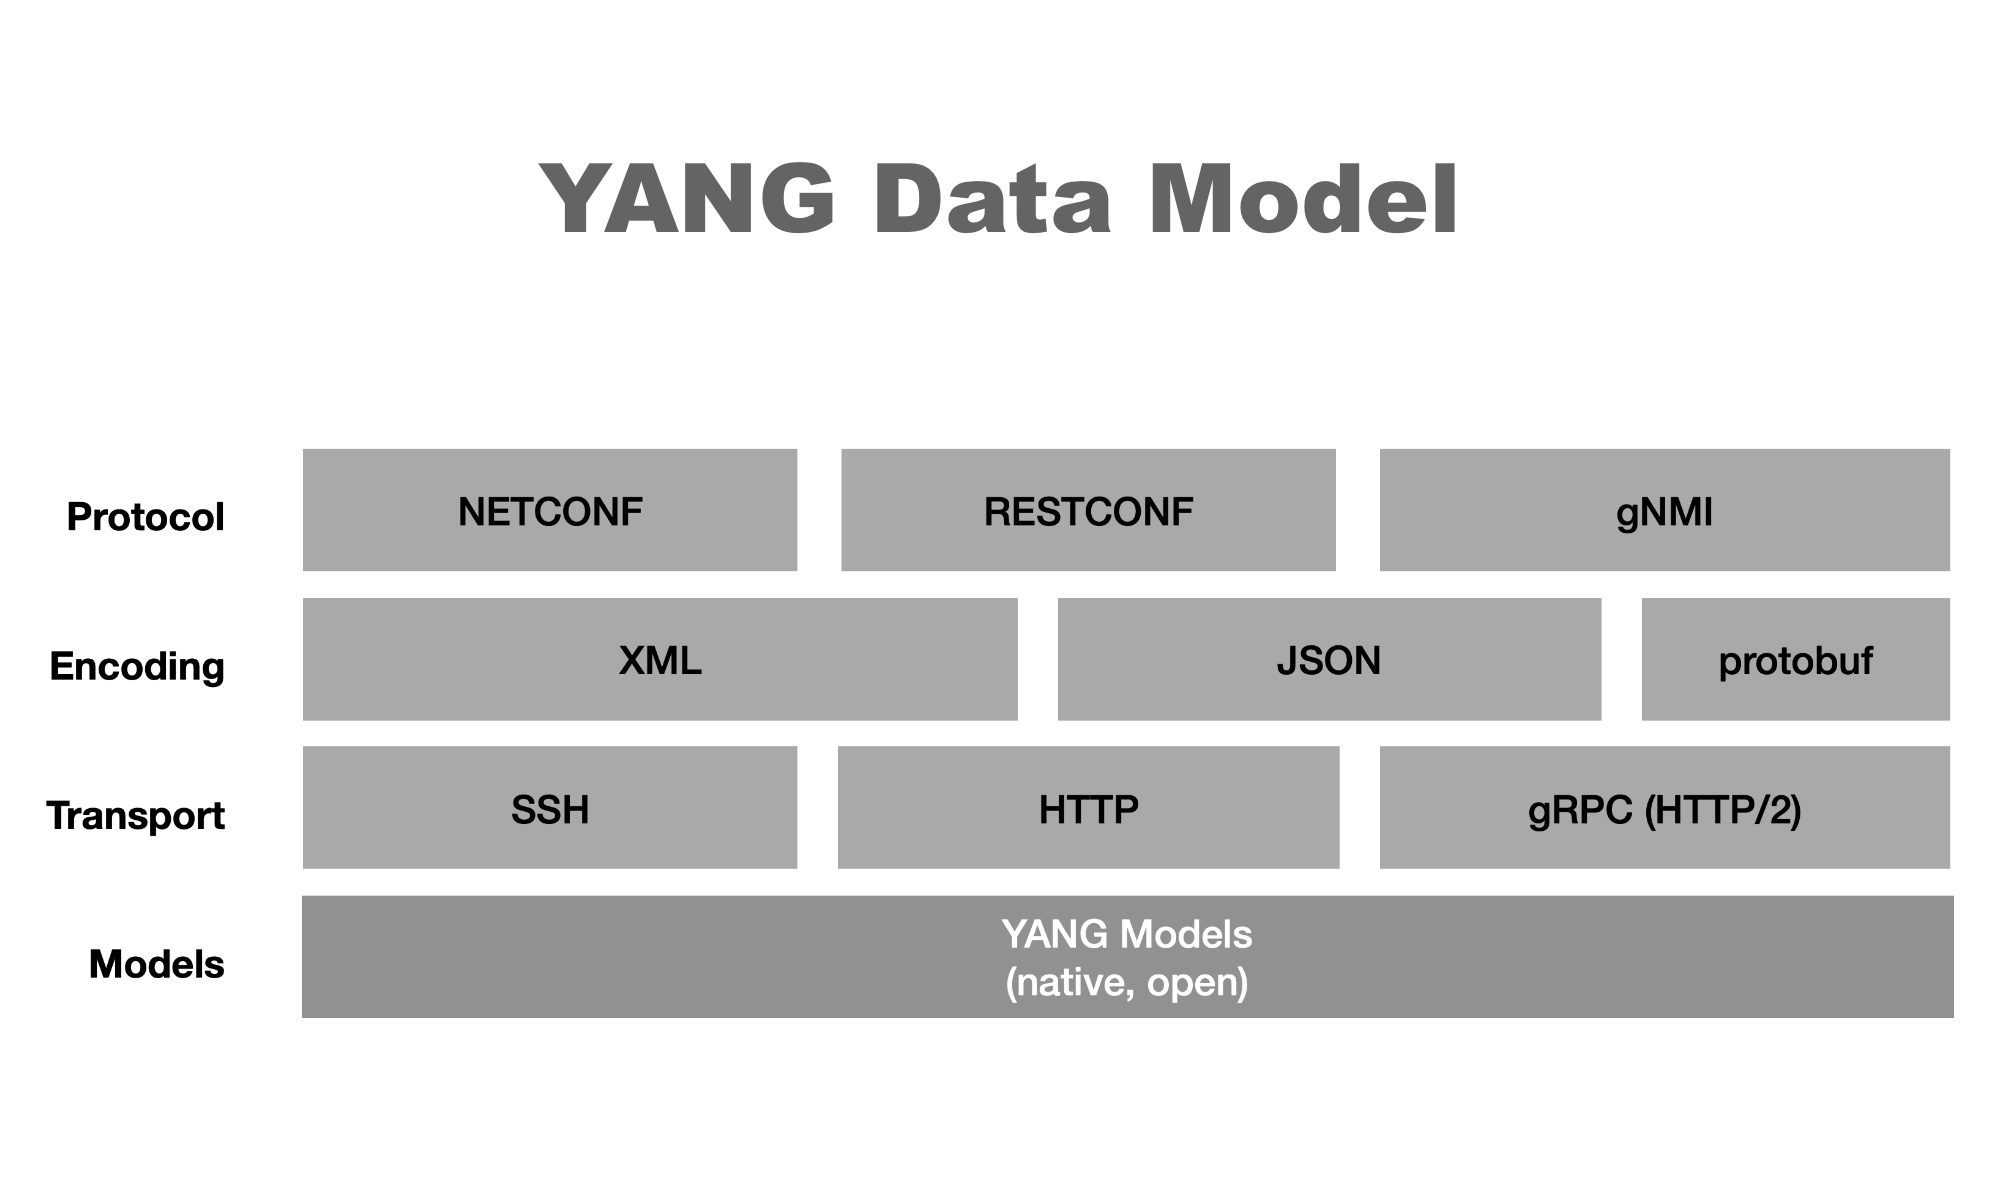 YANG Data Model